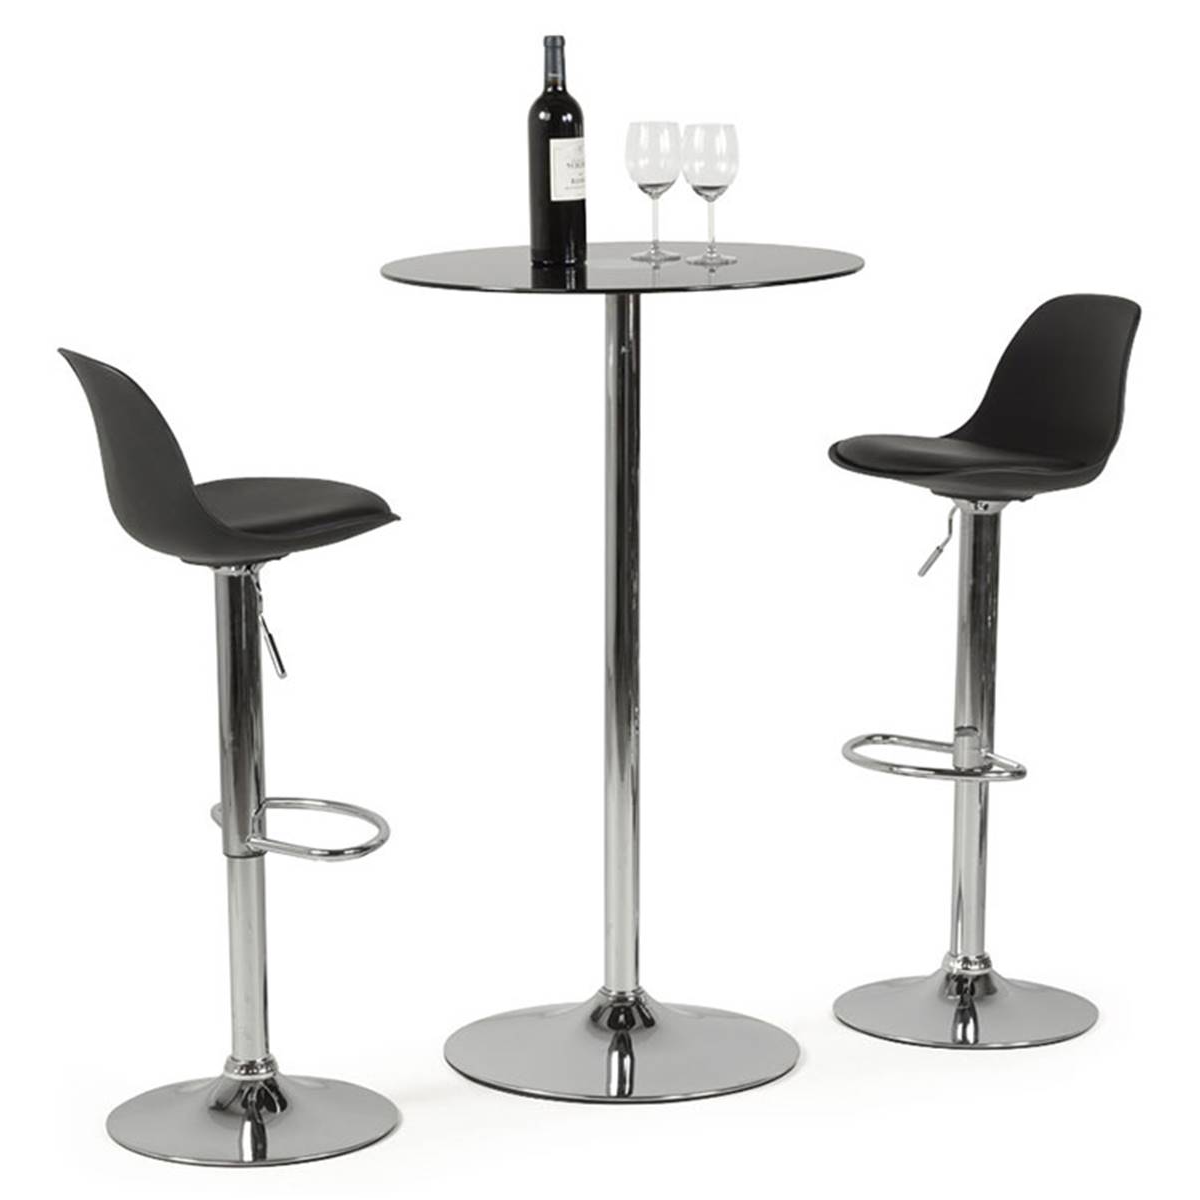 Table basse d 39 appoint scandinave ronde en bois blanc for Tables basses rondes en bois